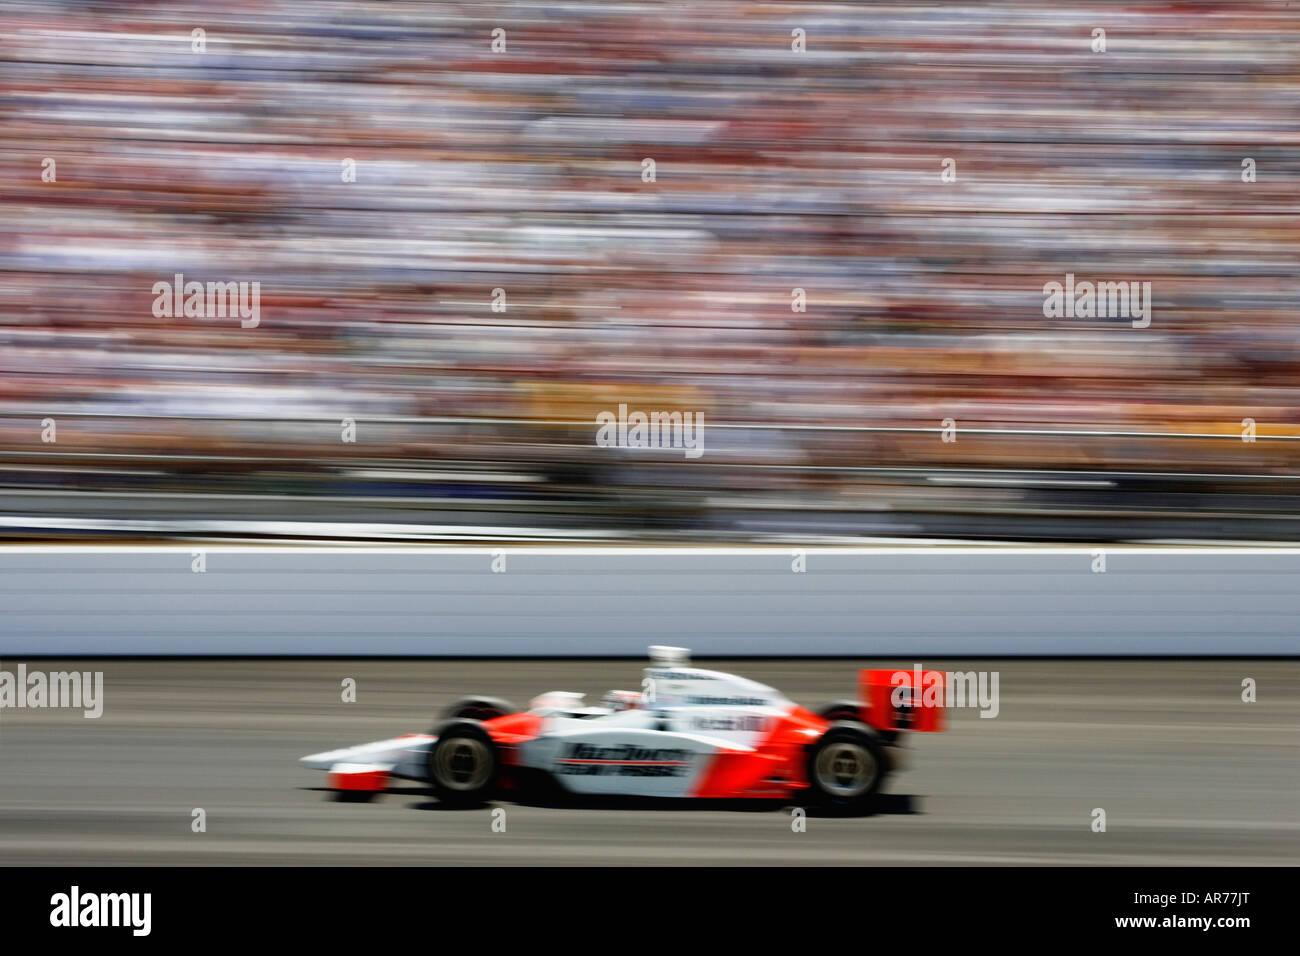 Rusty Wallace Chevrolet >> Penske Stock Photos & Penske Stock Images - Alamy